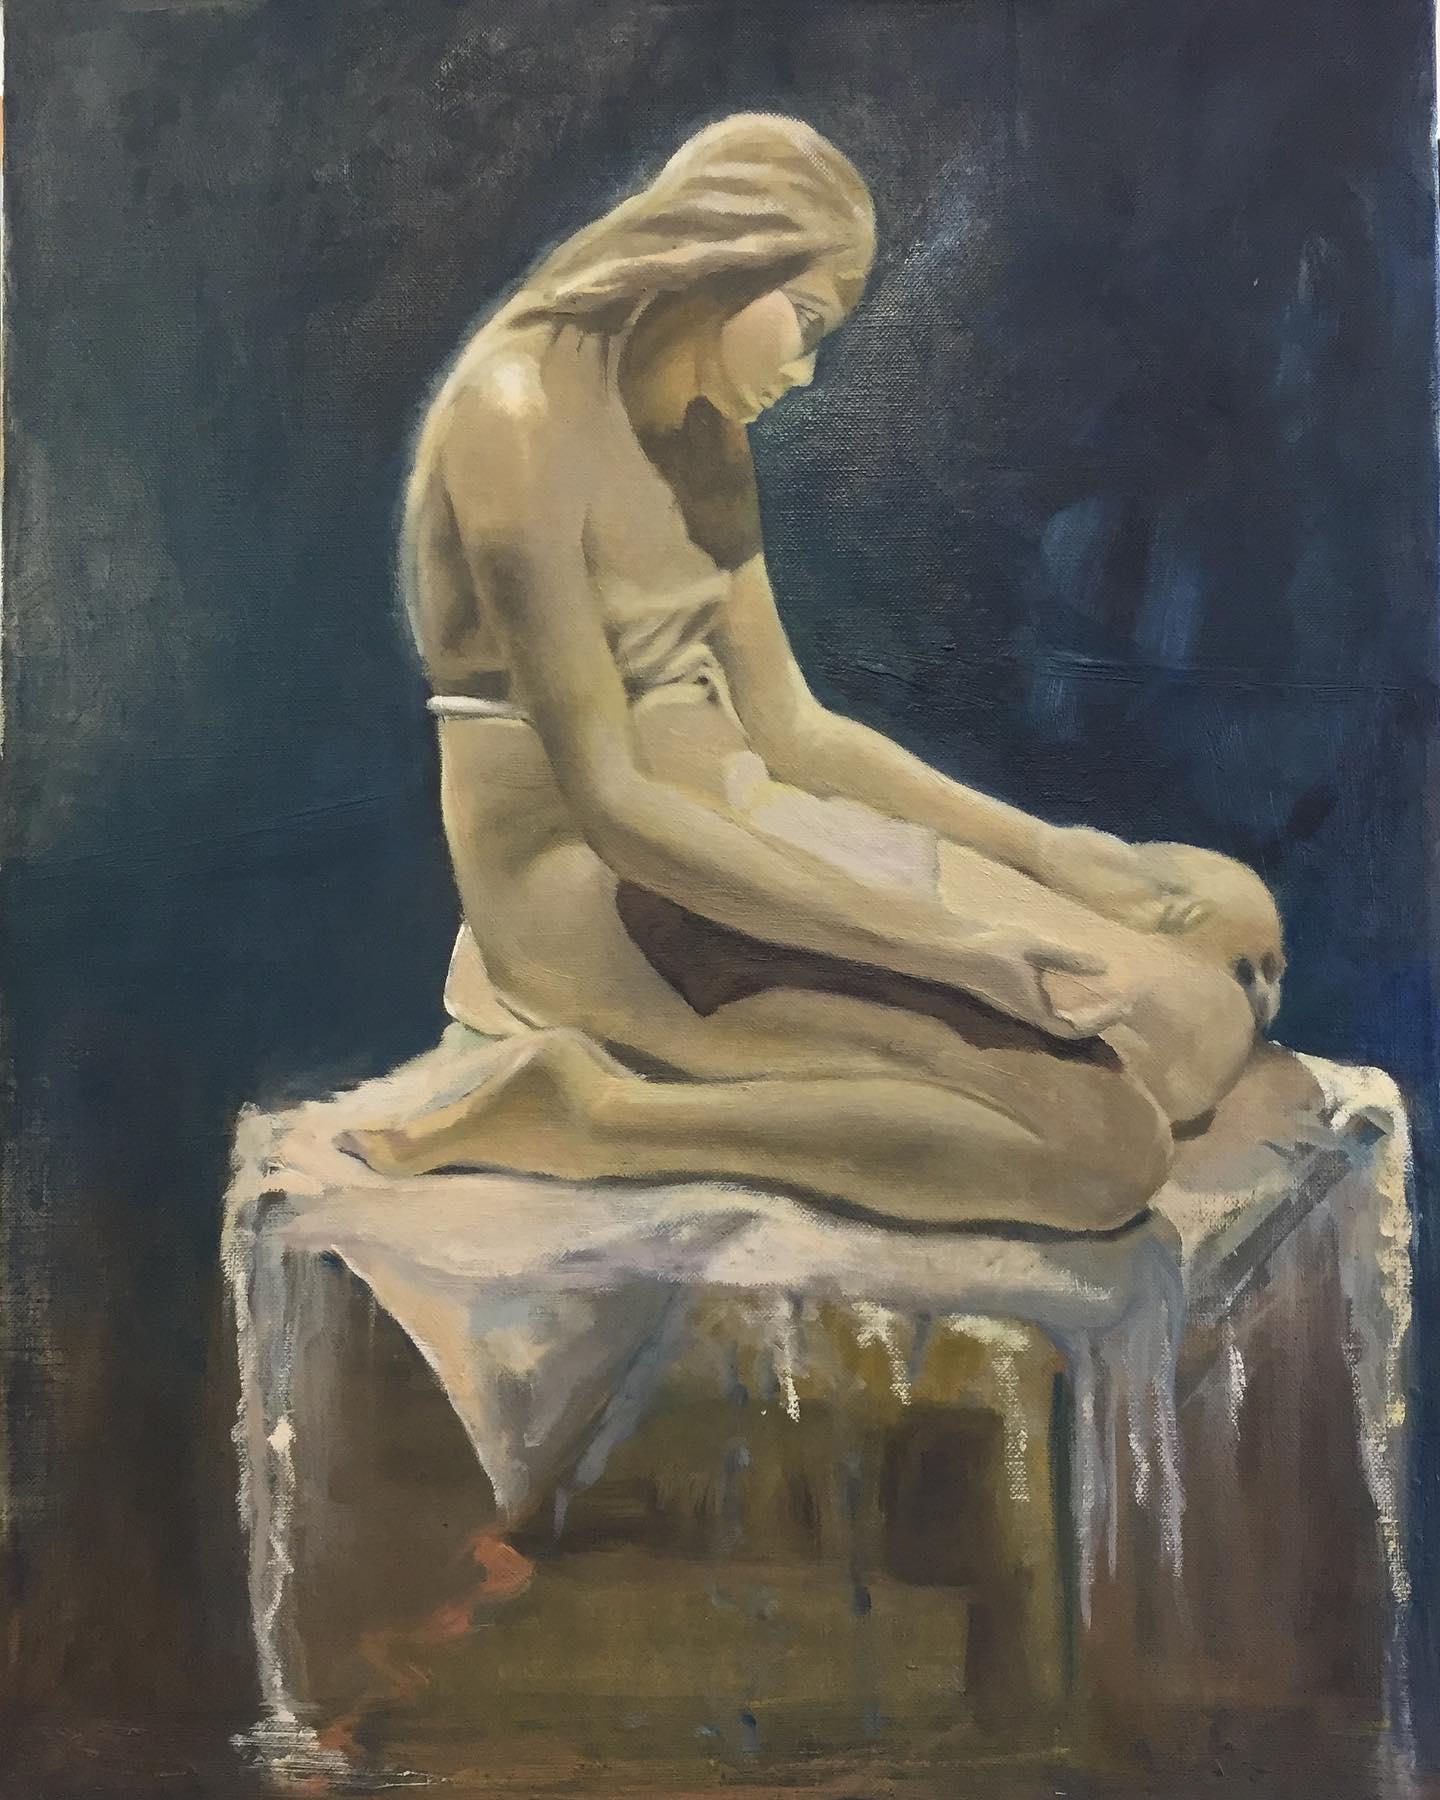 Persomofocation of statue